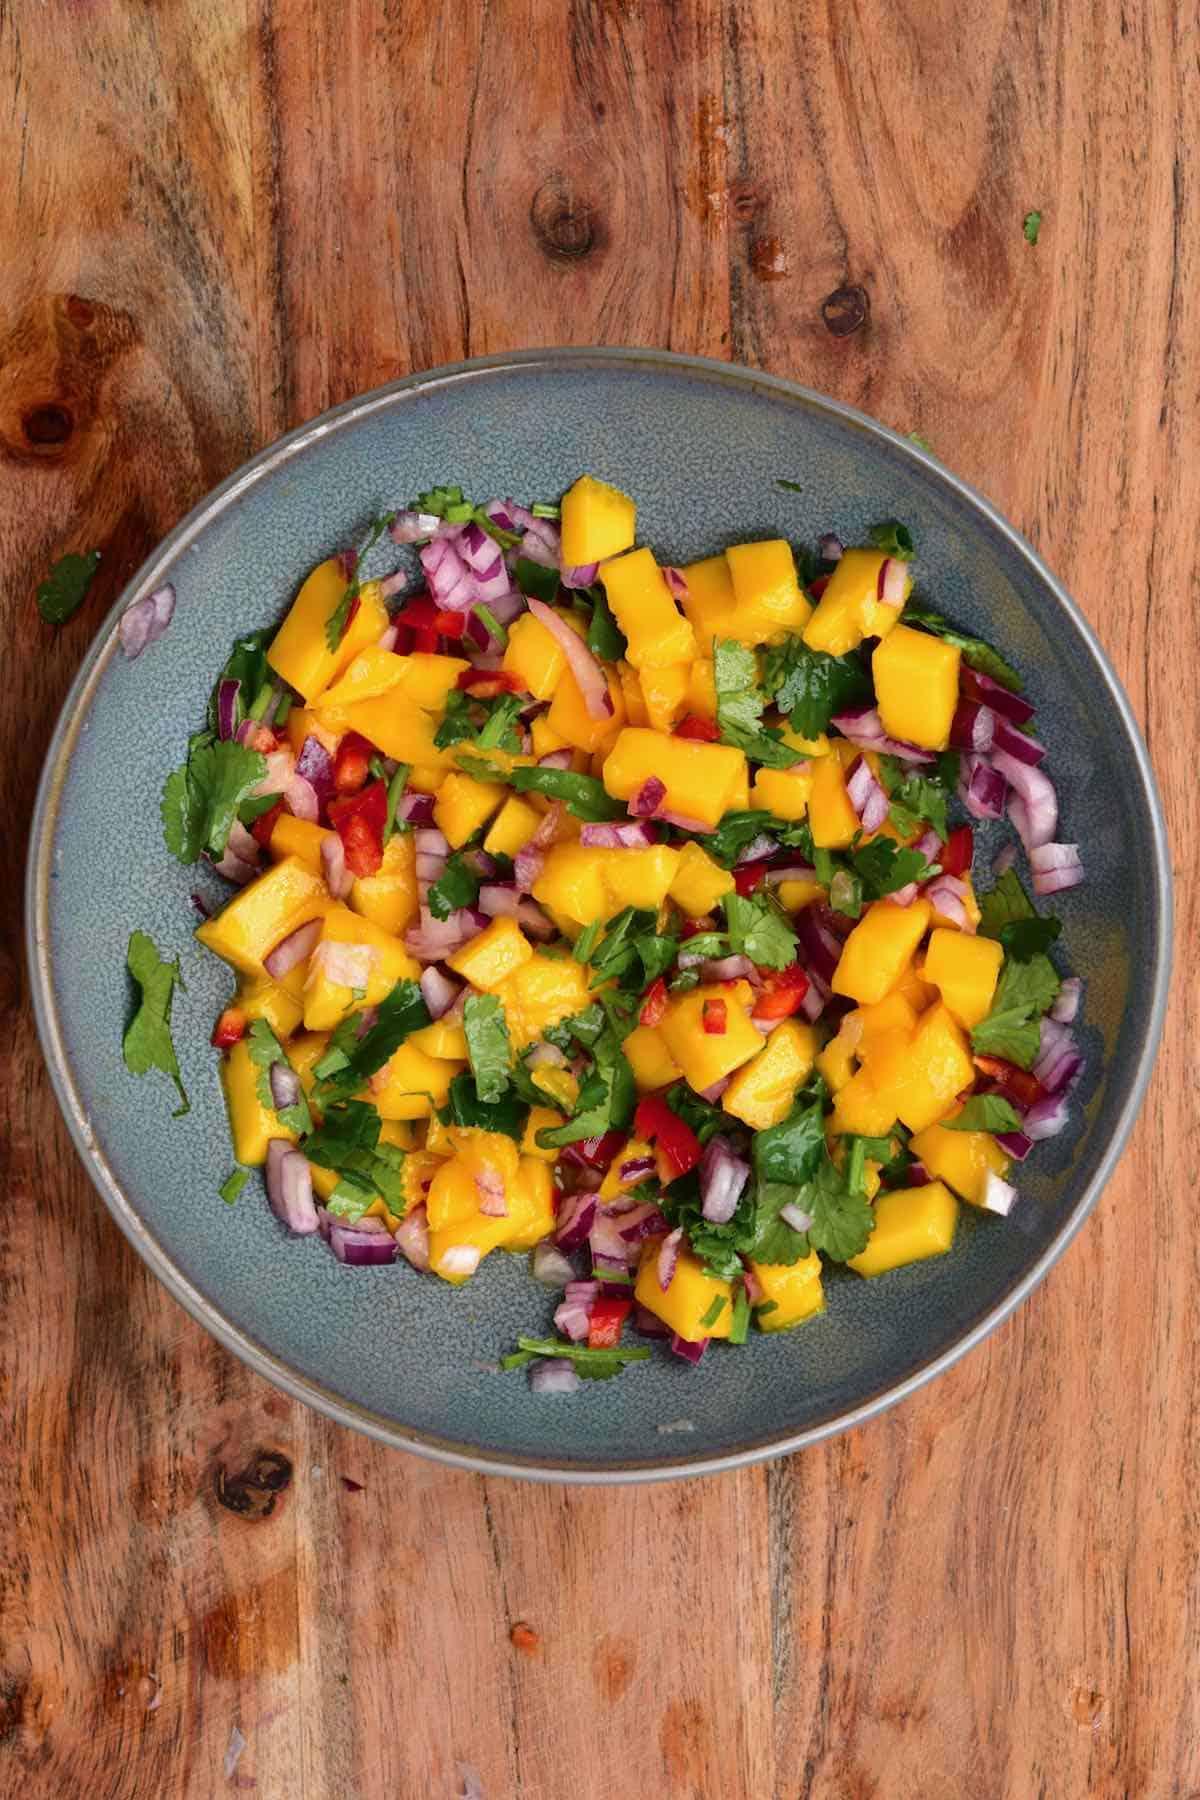 A bowl with mango and cilantro salsa